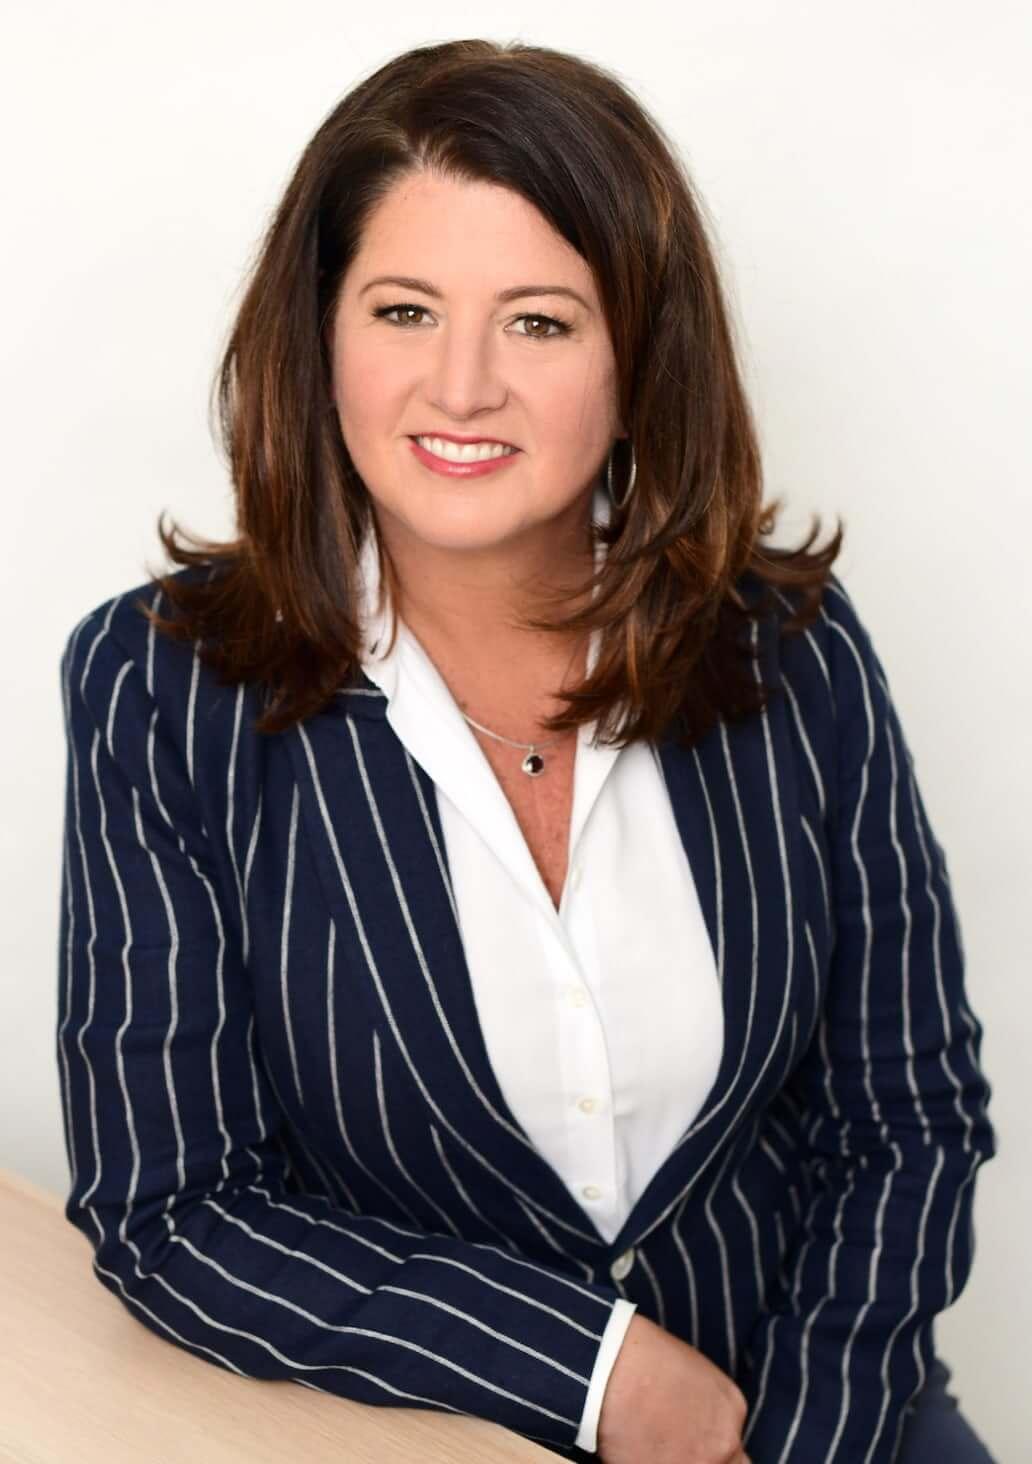 Lisa Brezonik, CEO